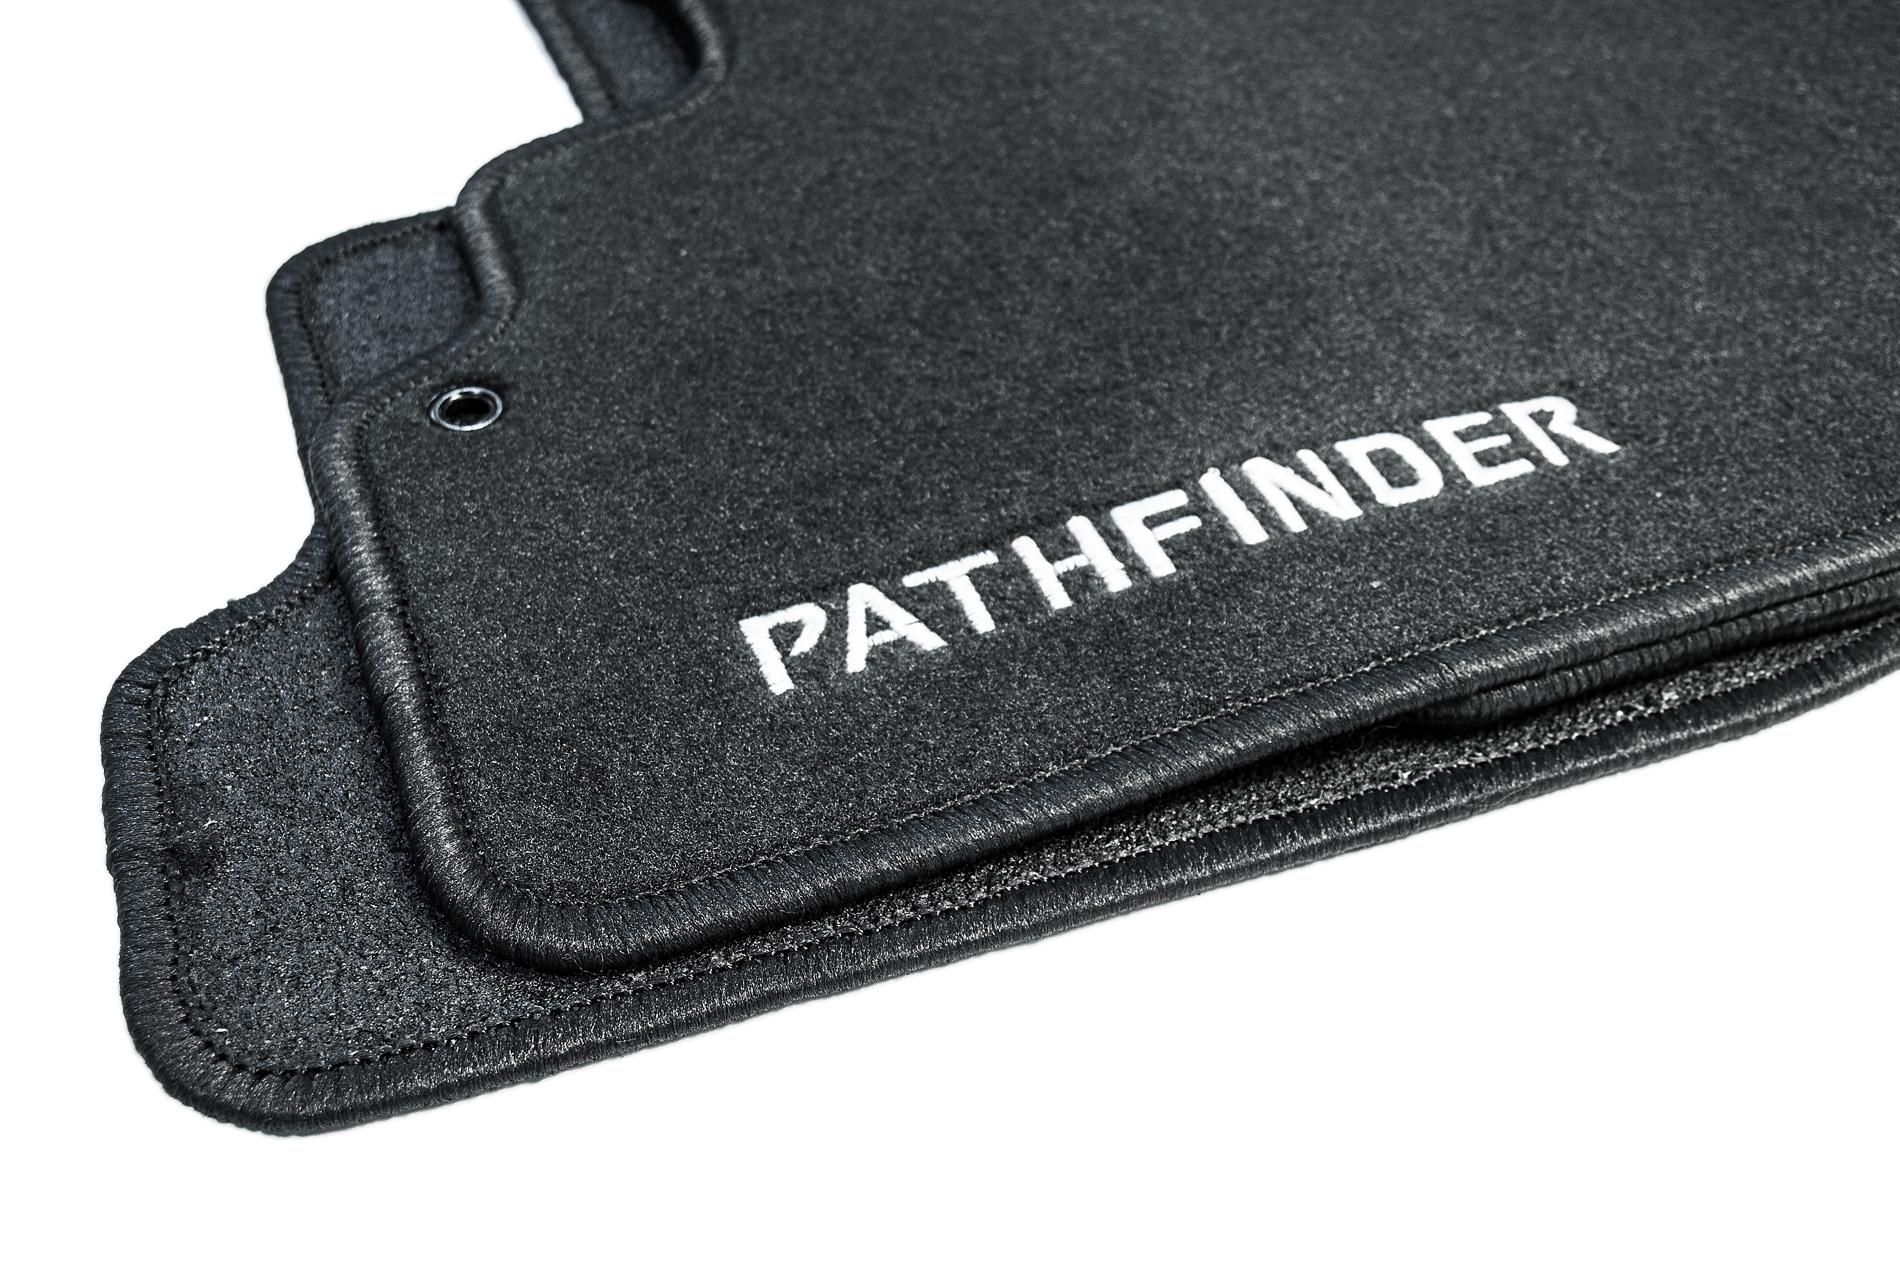 Rubber floor mats nissan pathfinder 2013 - Genuine Nissan Nissan Pathfinder Genuine Floor Mats Luxury Textile